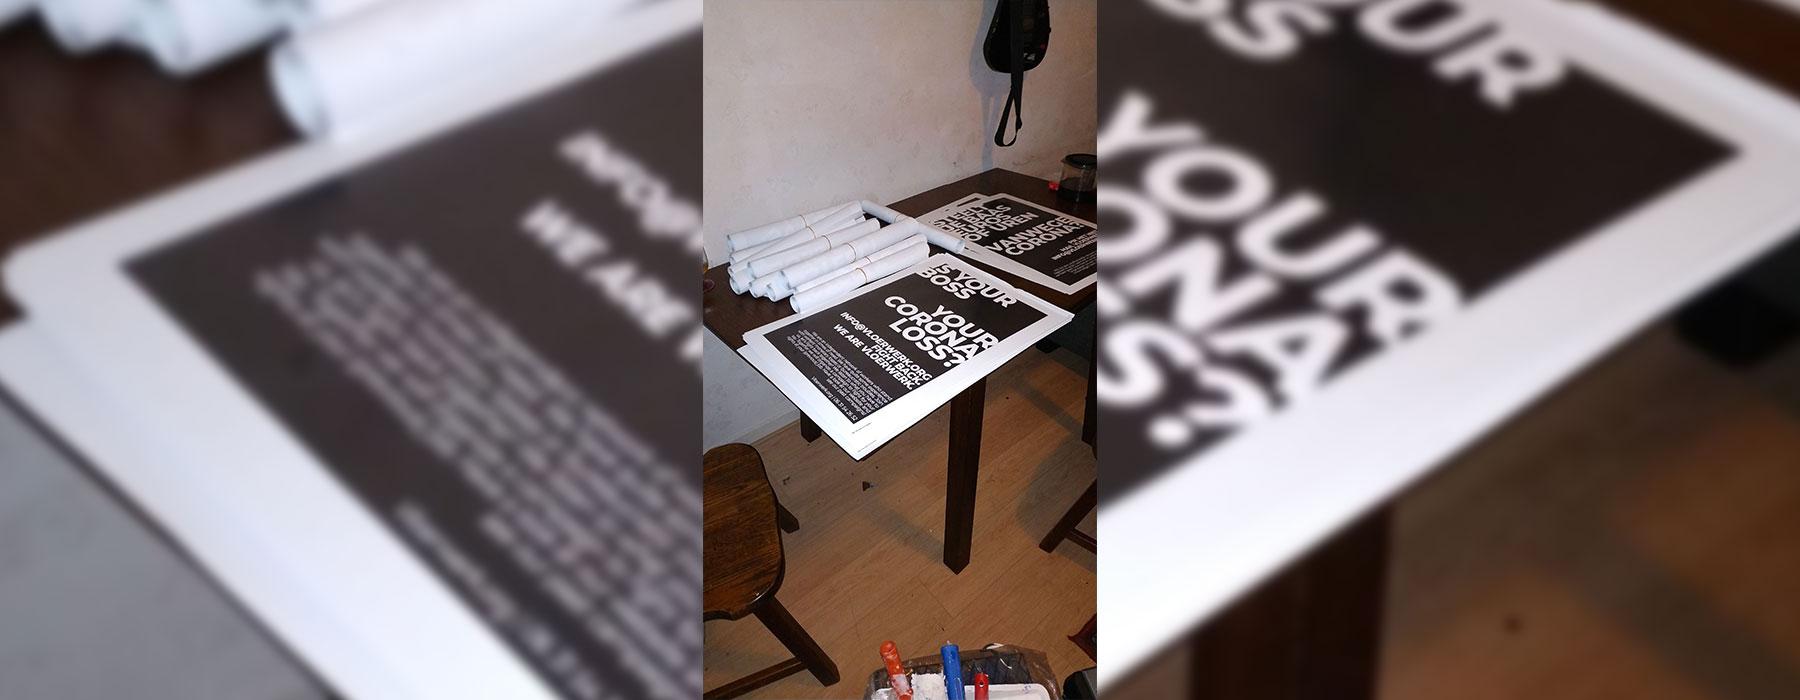 plakvoorbereiding vloerwerk corona